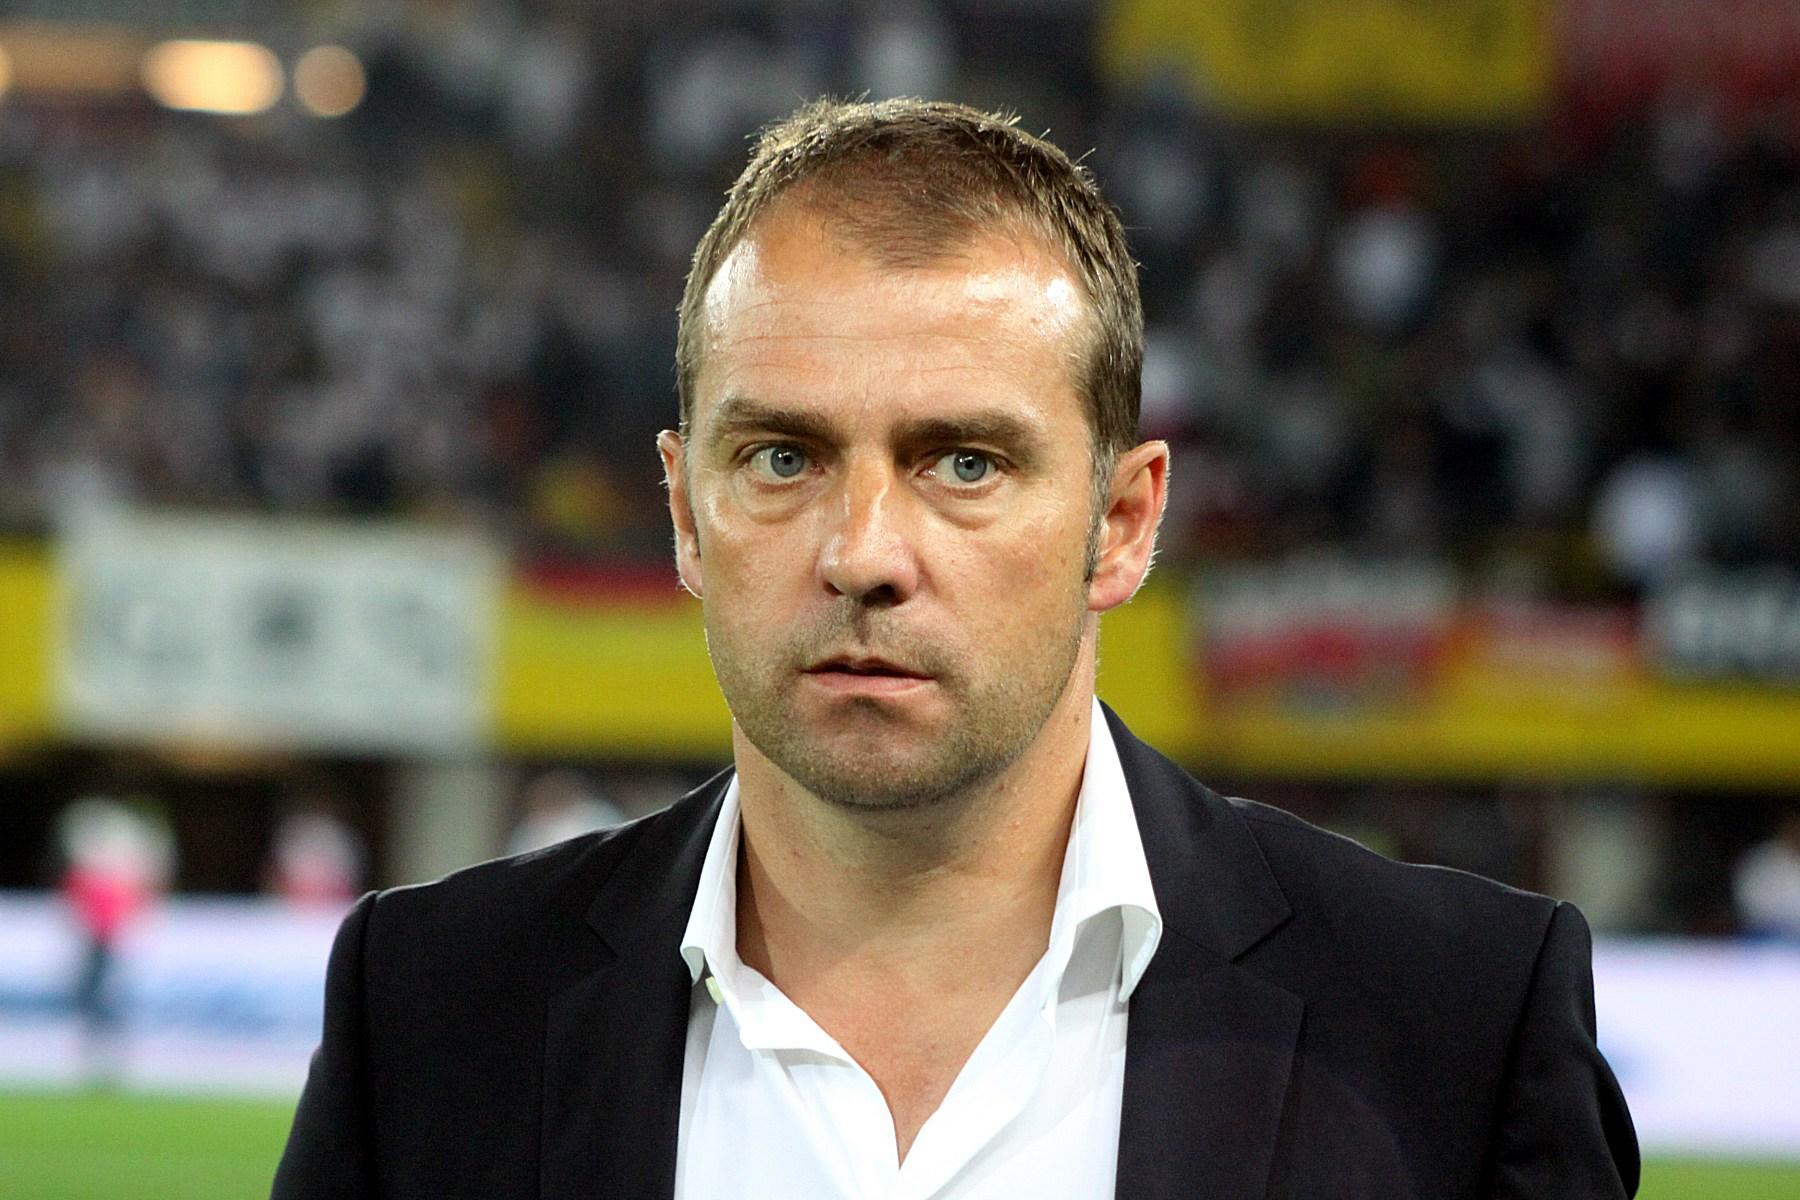 Hans-Dieter_Flick,_Germany_national_football_team_(02).jpg